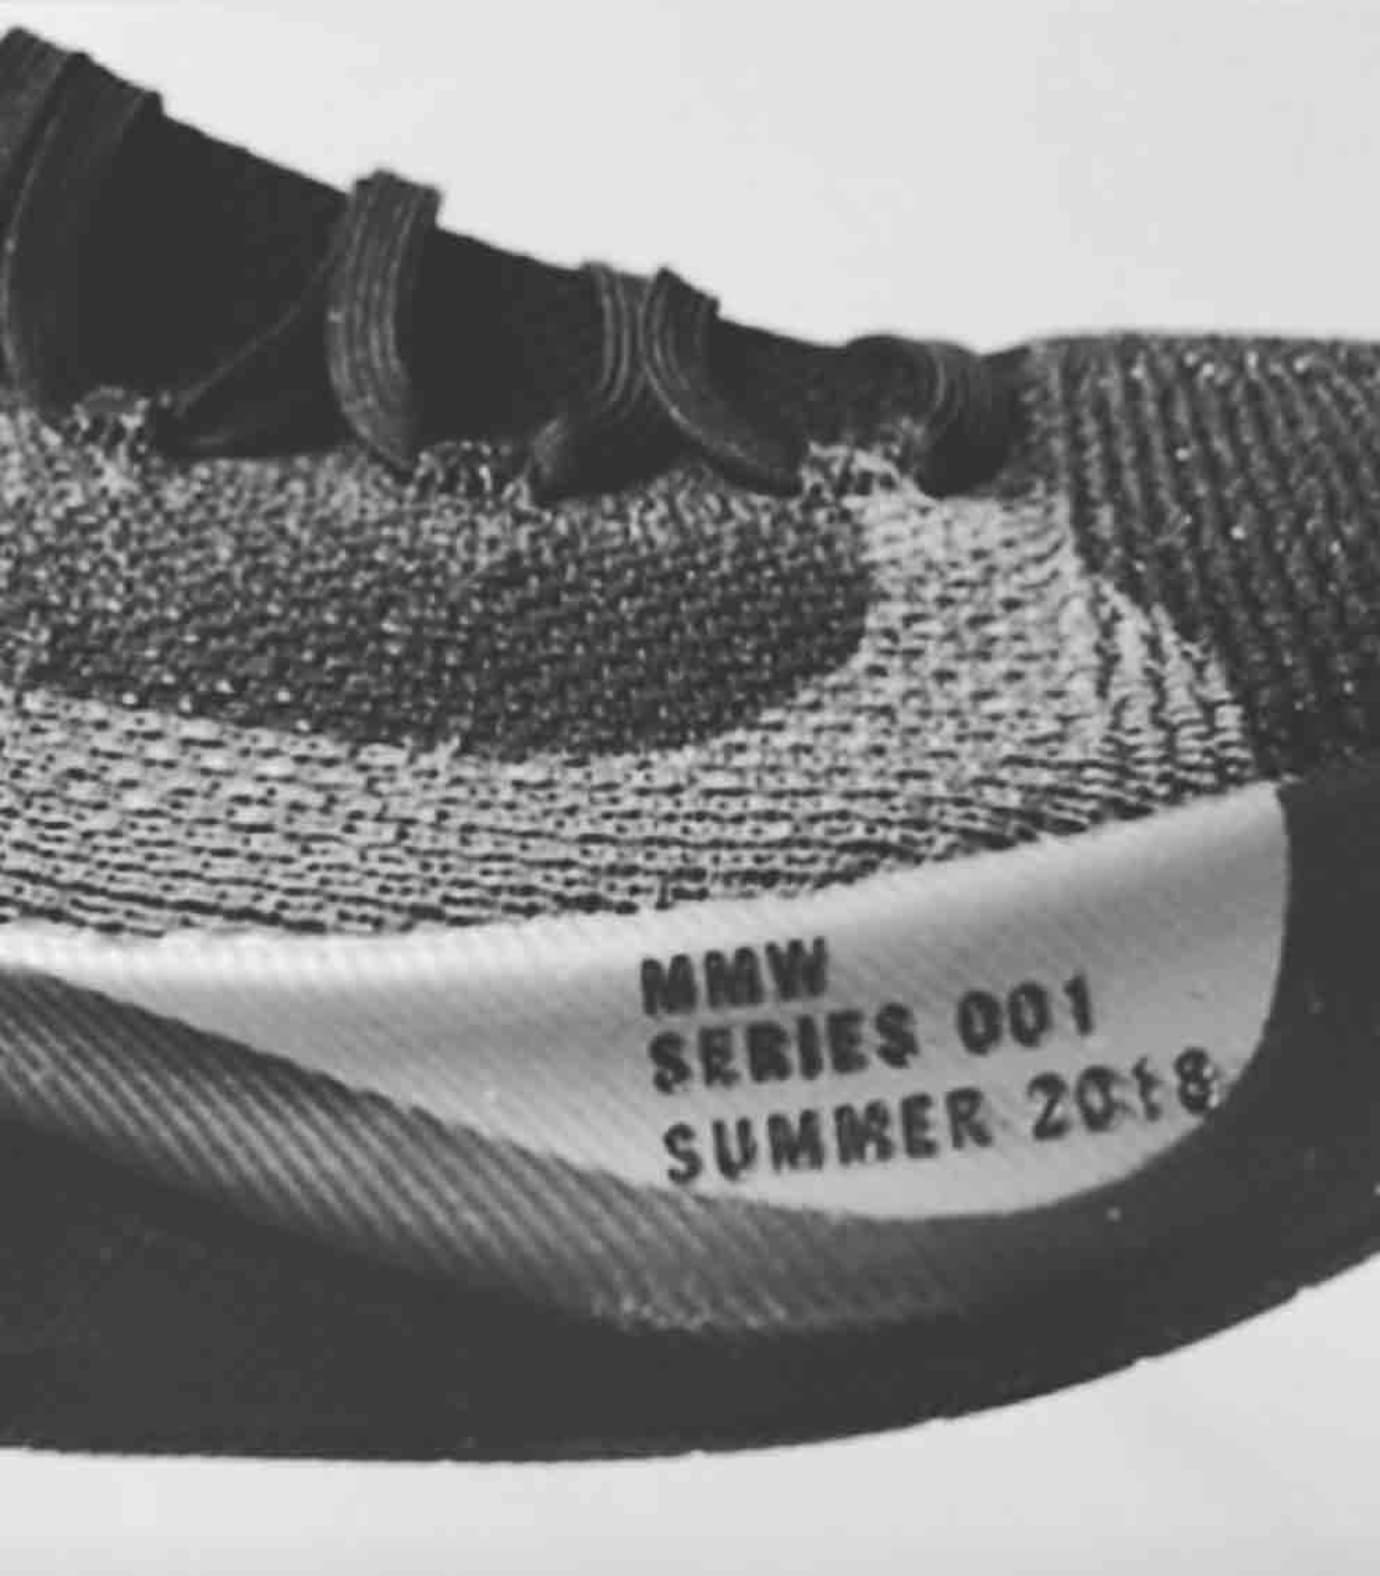 Matthew M. Williams x Nike Vapor Street Flyknit (Detail)